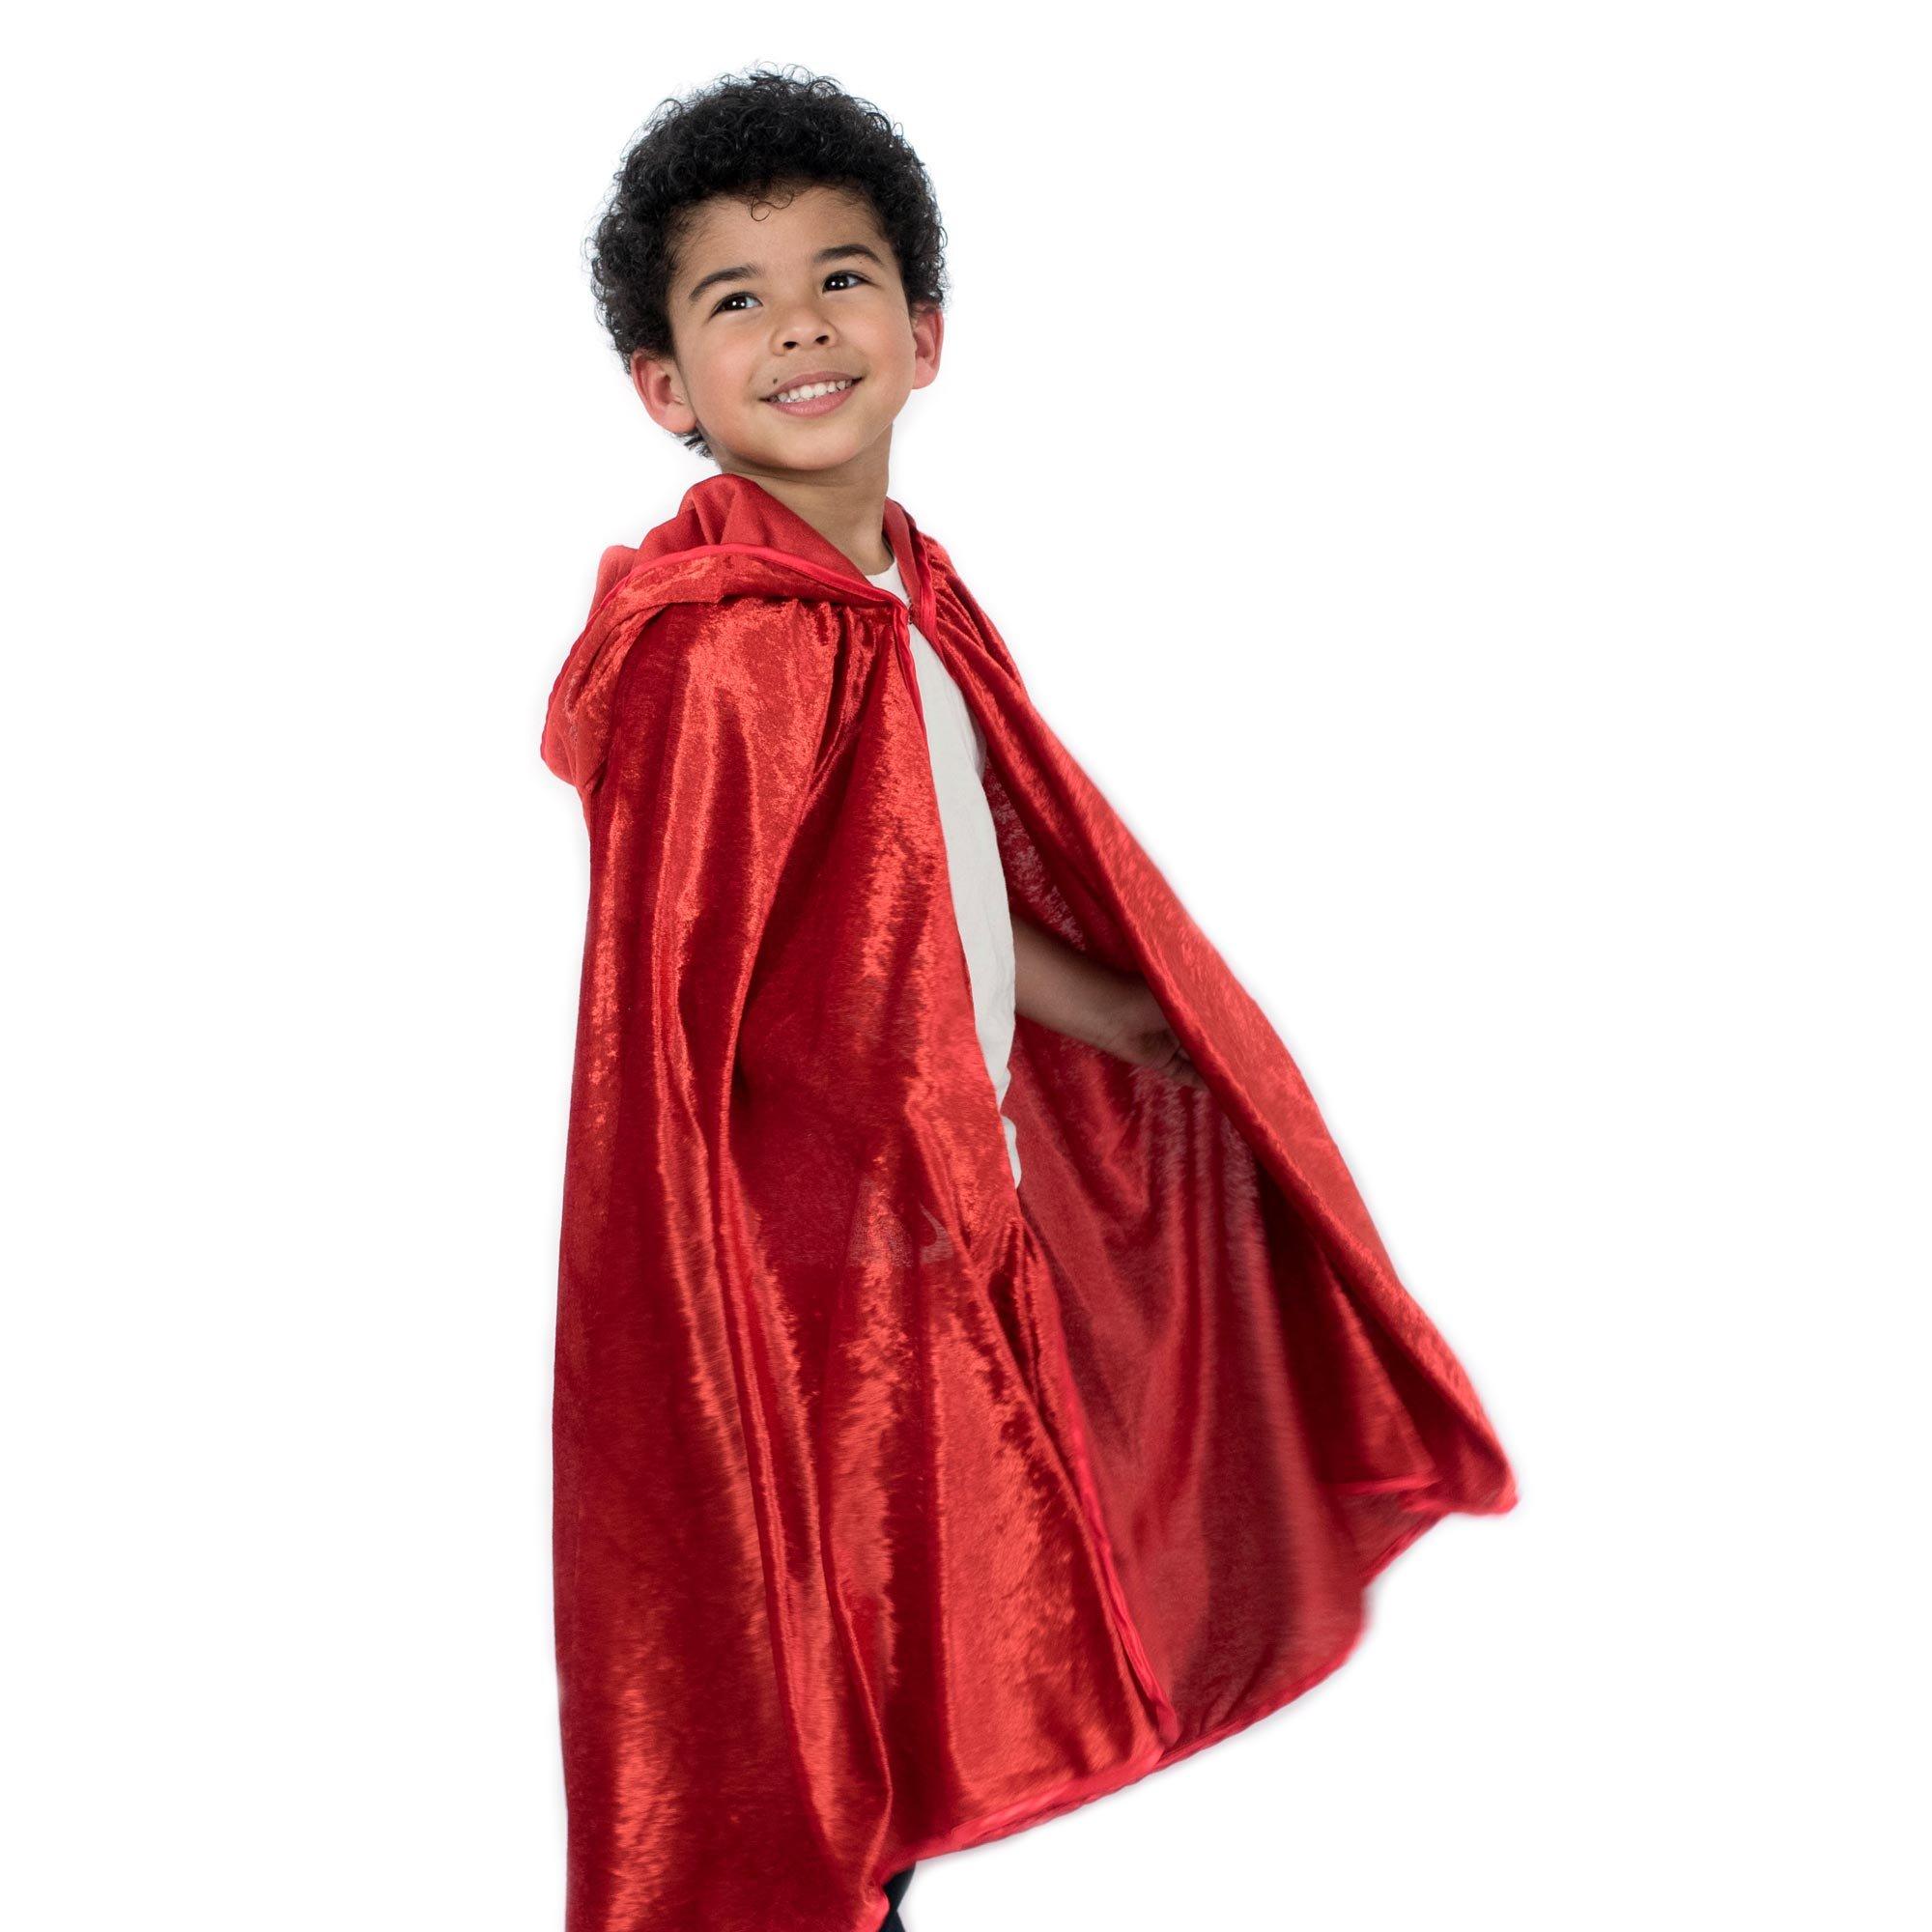 Kids Cosplay Hooded Cloak Cape - Red